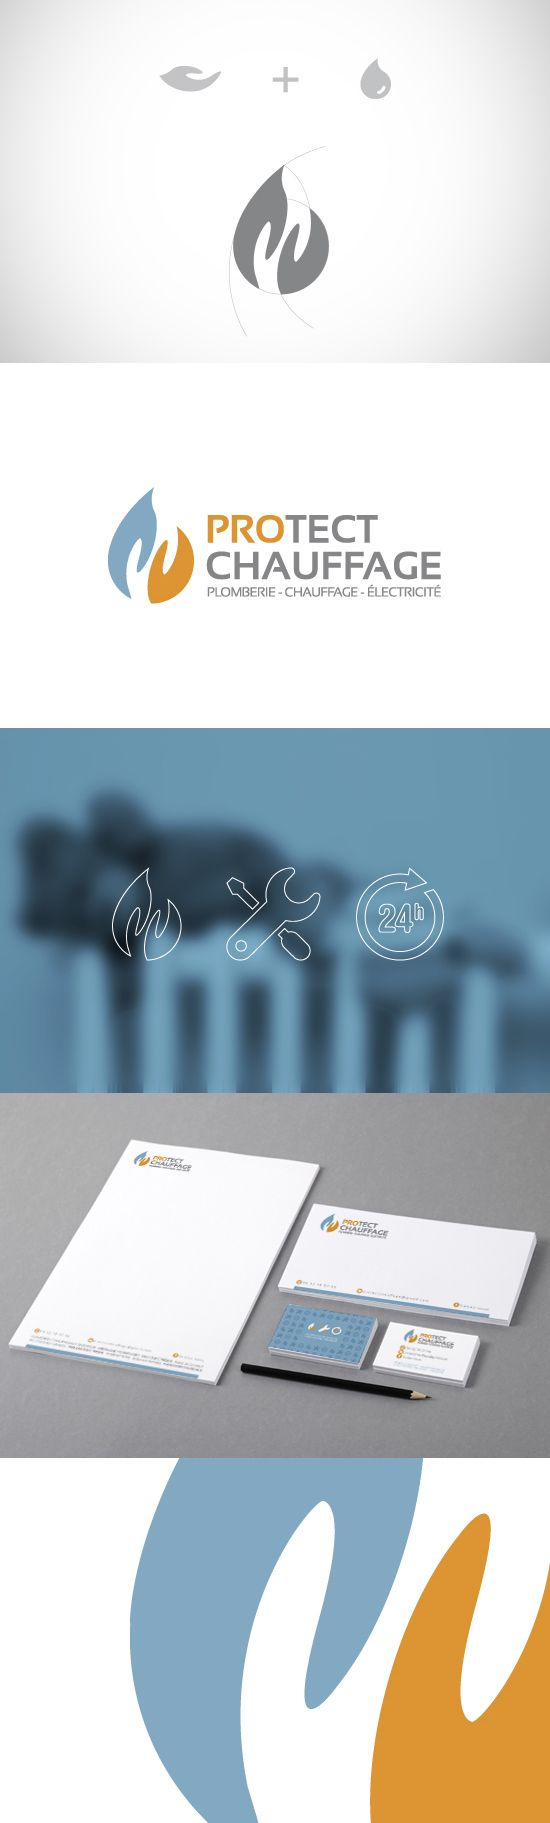 Logo Protect Chauffage - by clubincom